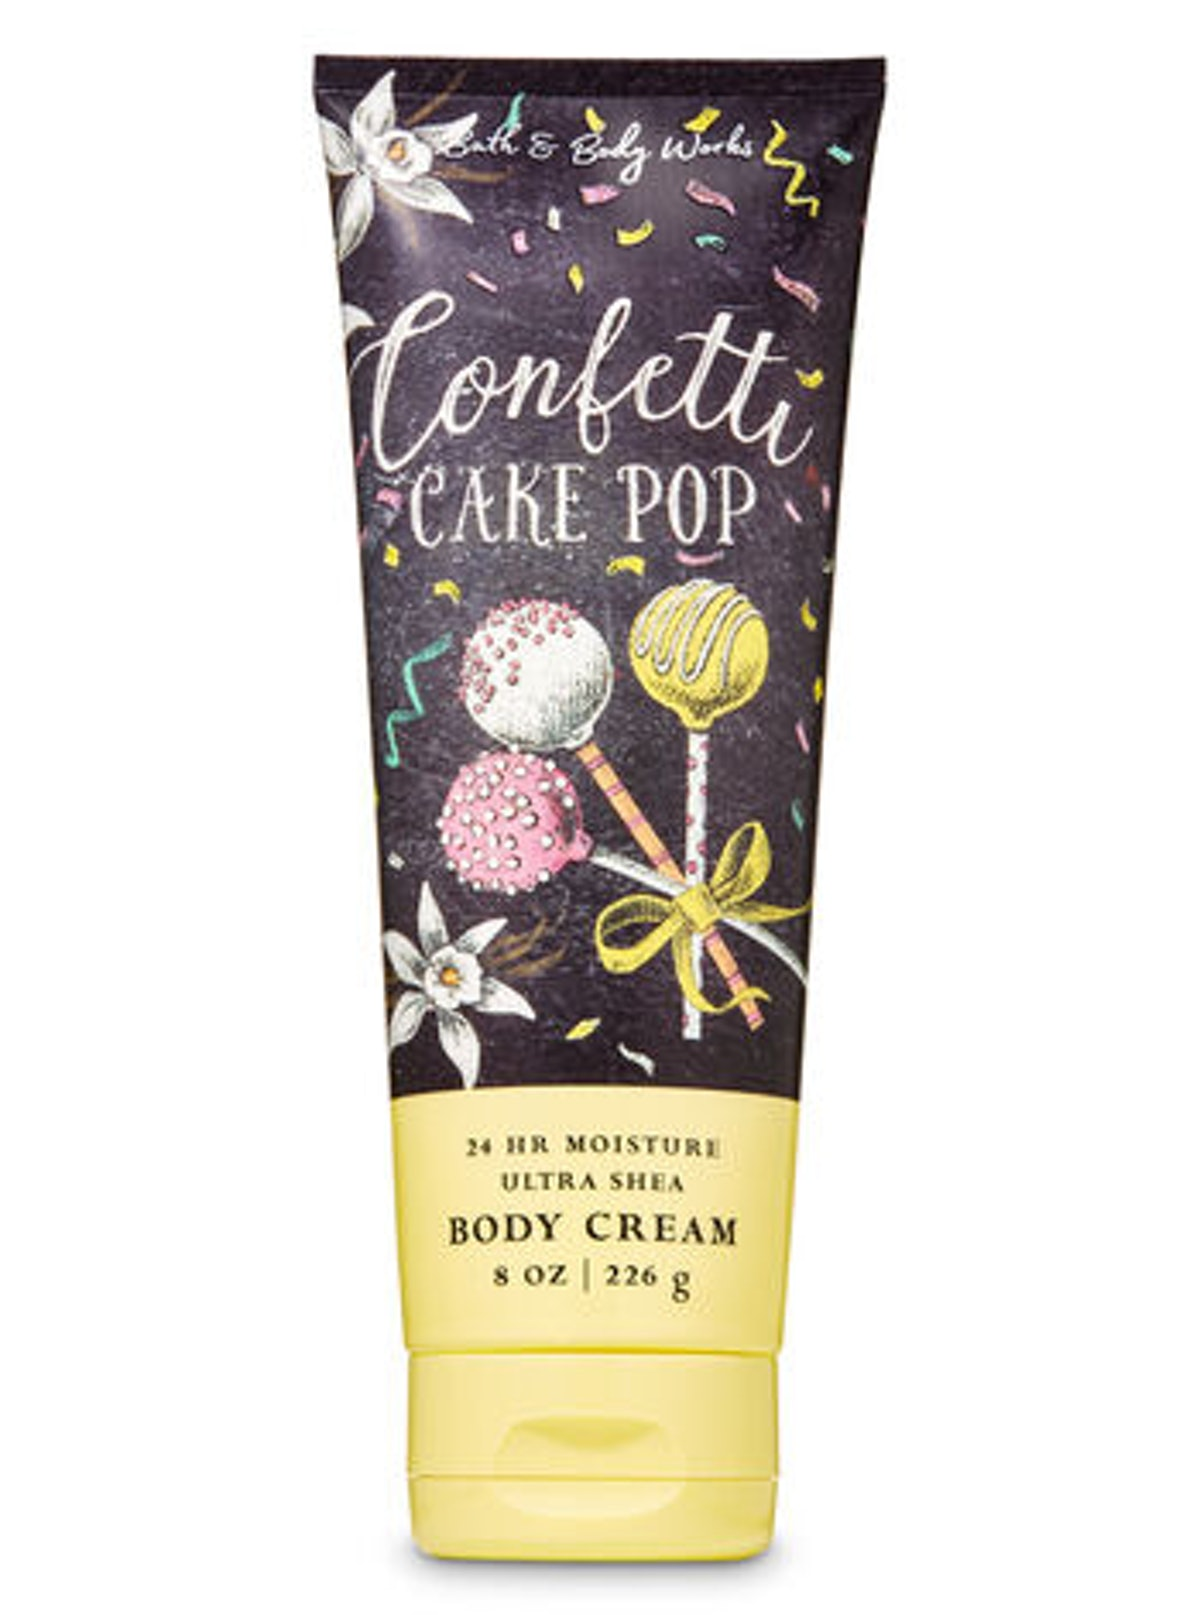 Confetti Cake Pop Ultra Shea Body Cream